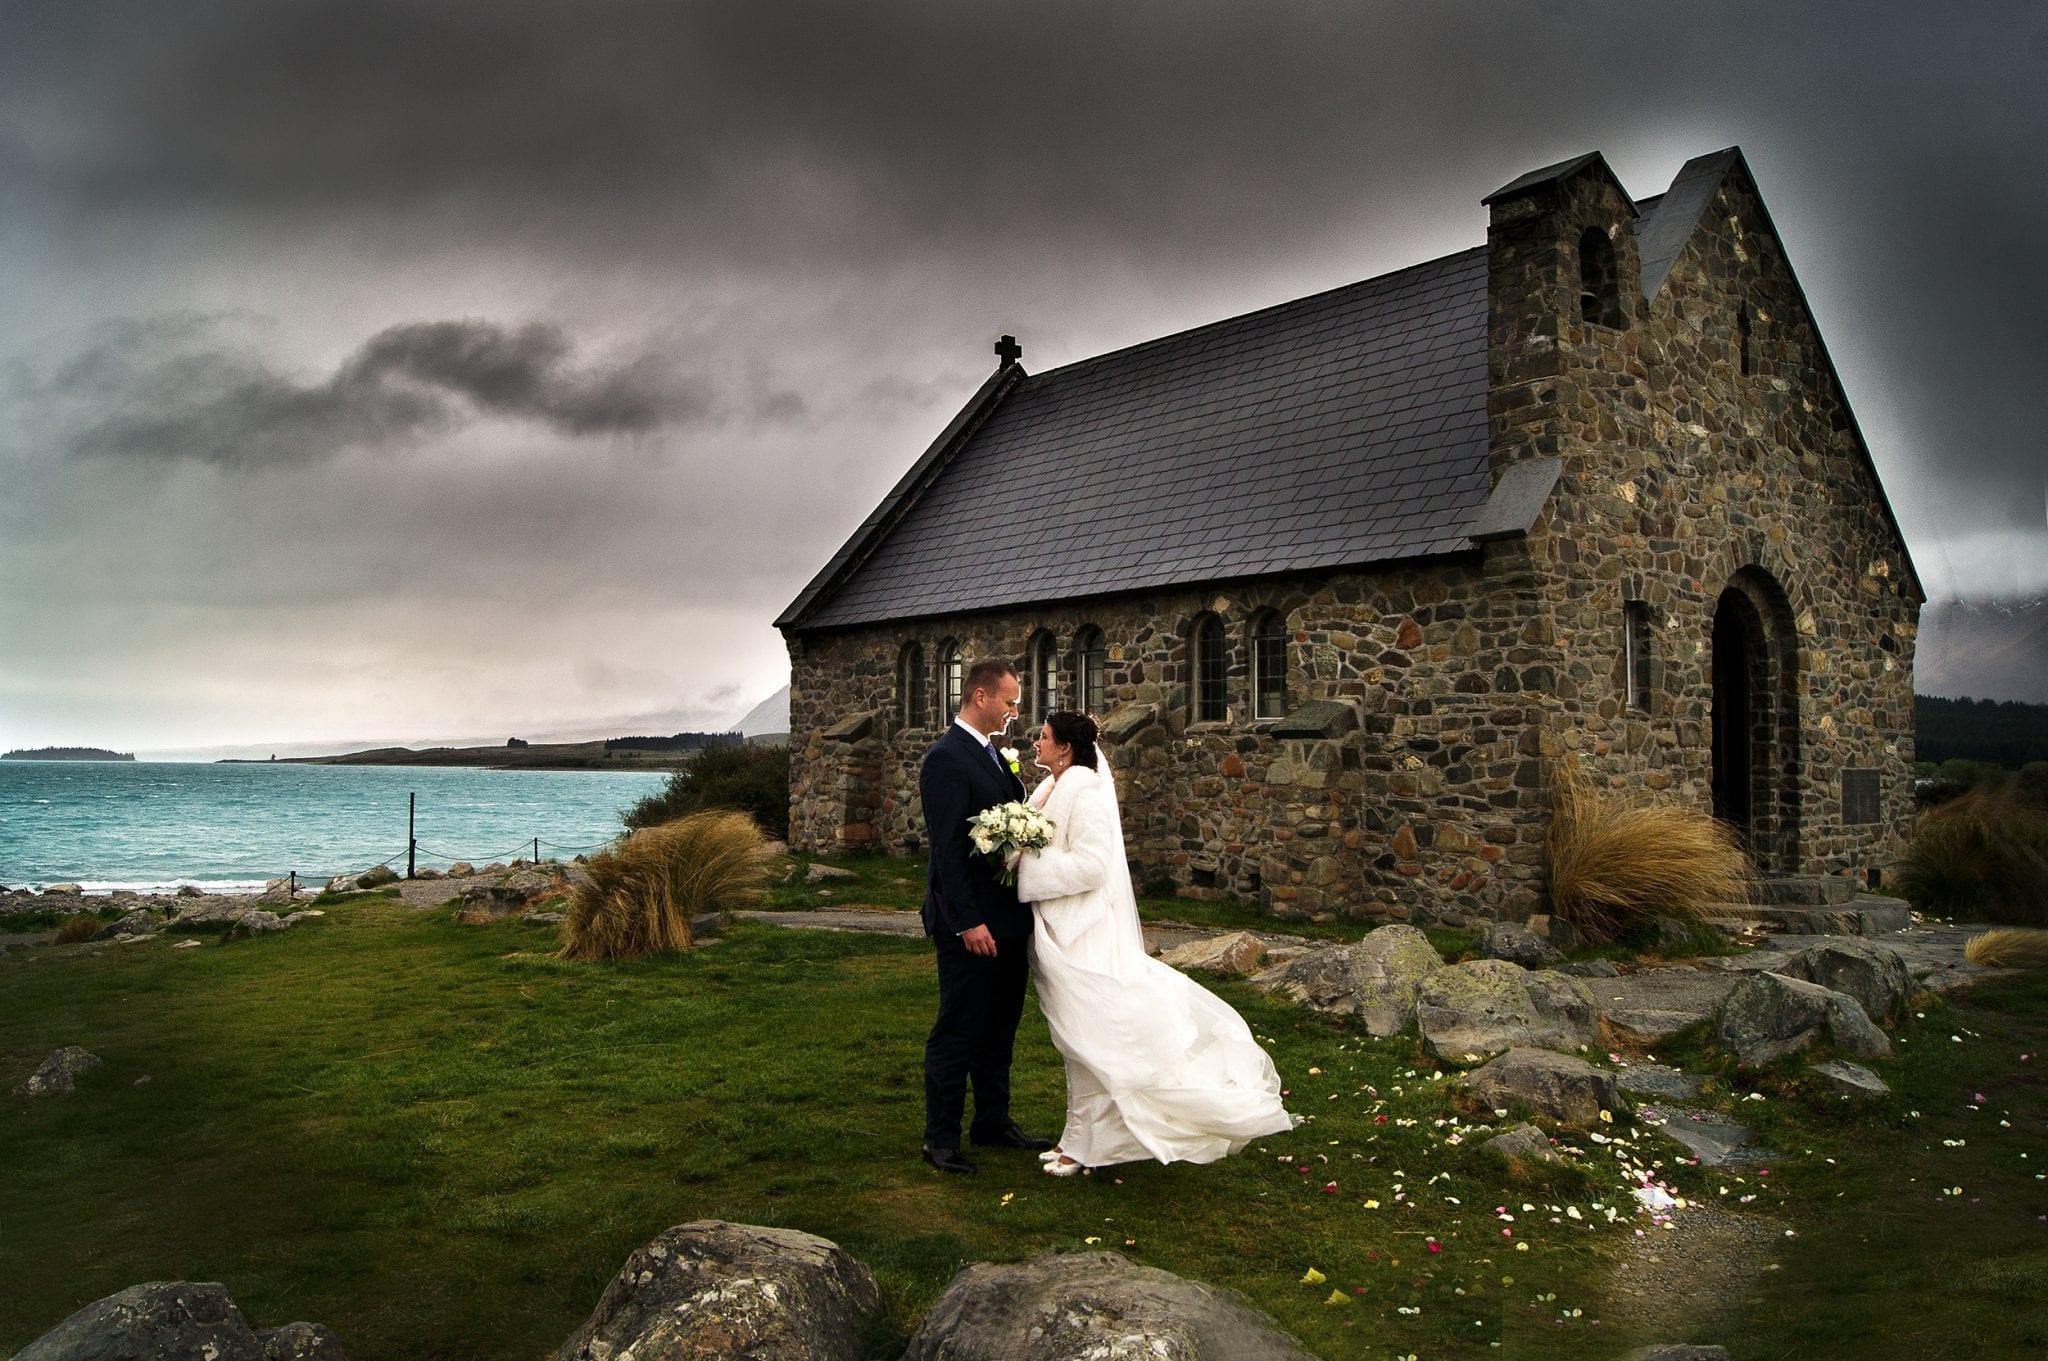 kimchanevents| Amy holding wedding bouquet and Matt at Lake Tekapo Church of the Good Sheppherd